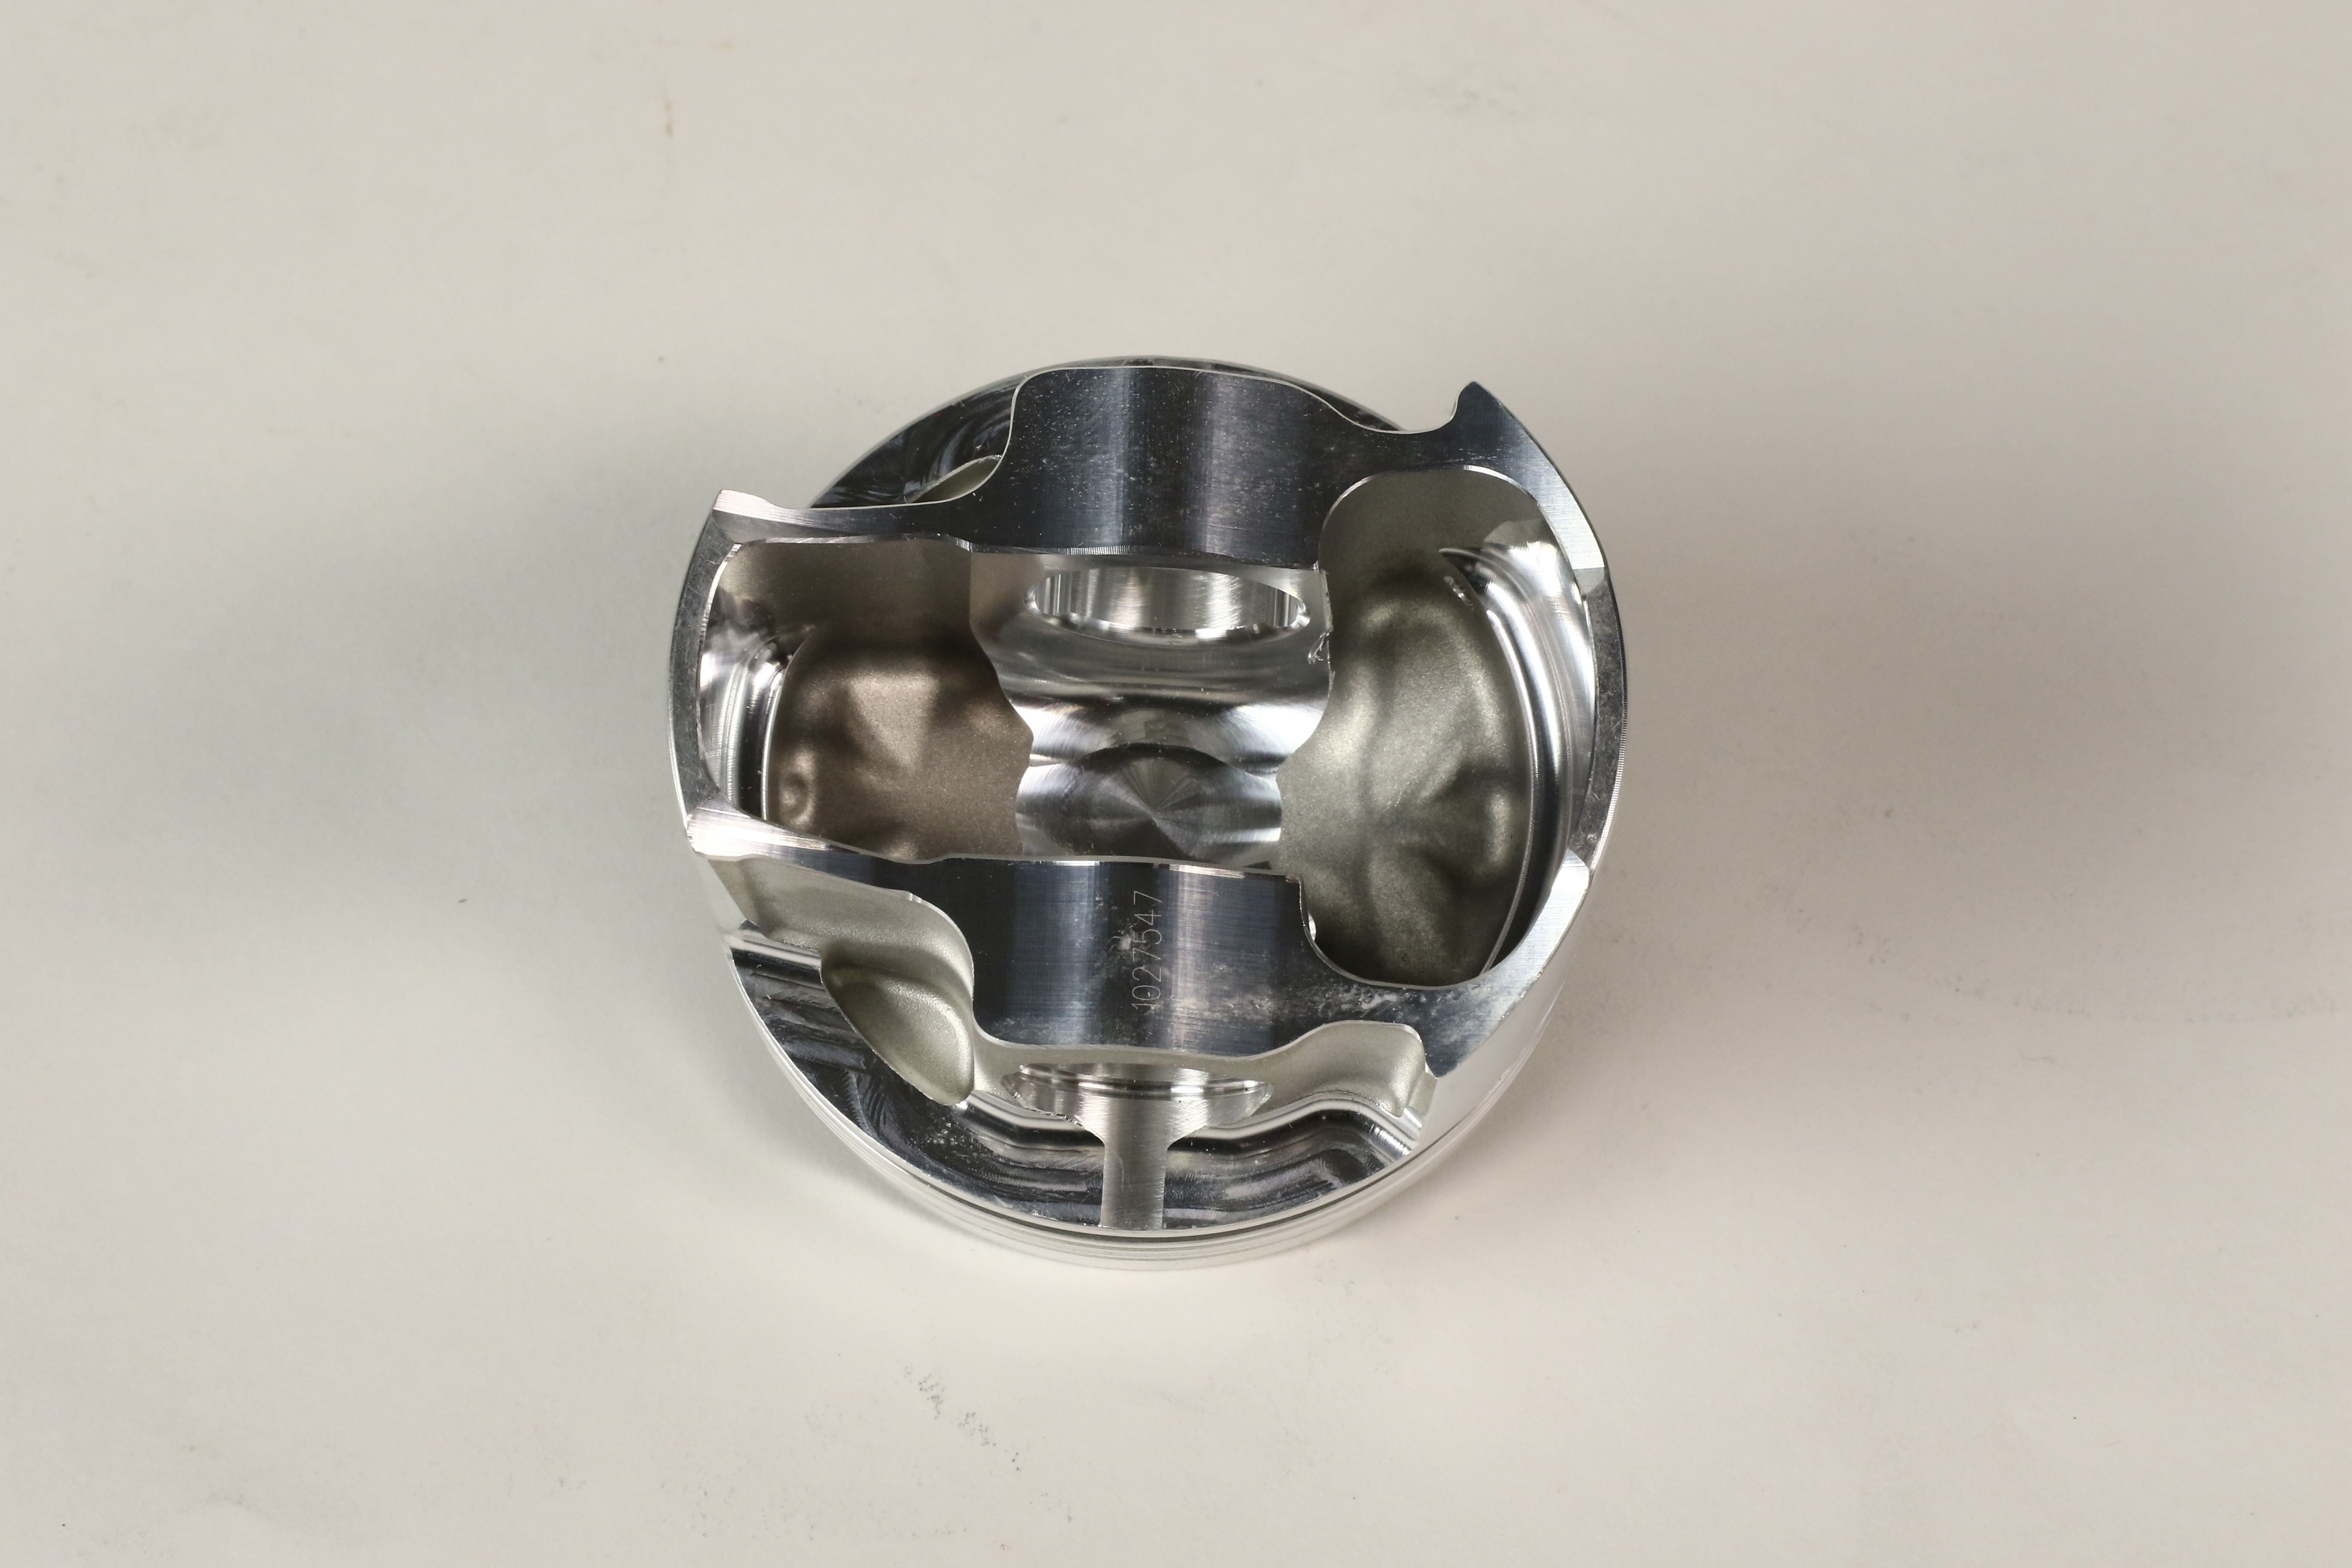 Explained: Symmetrical, Asymmetrical, and Full-Round Piston